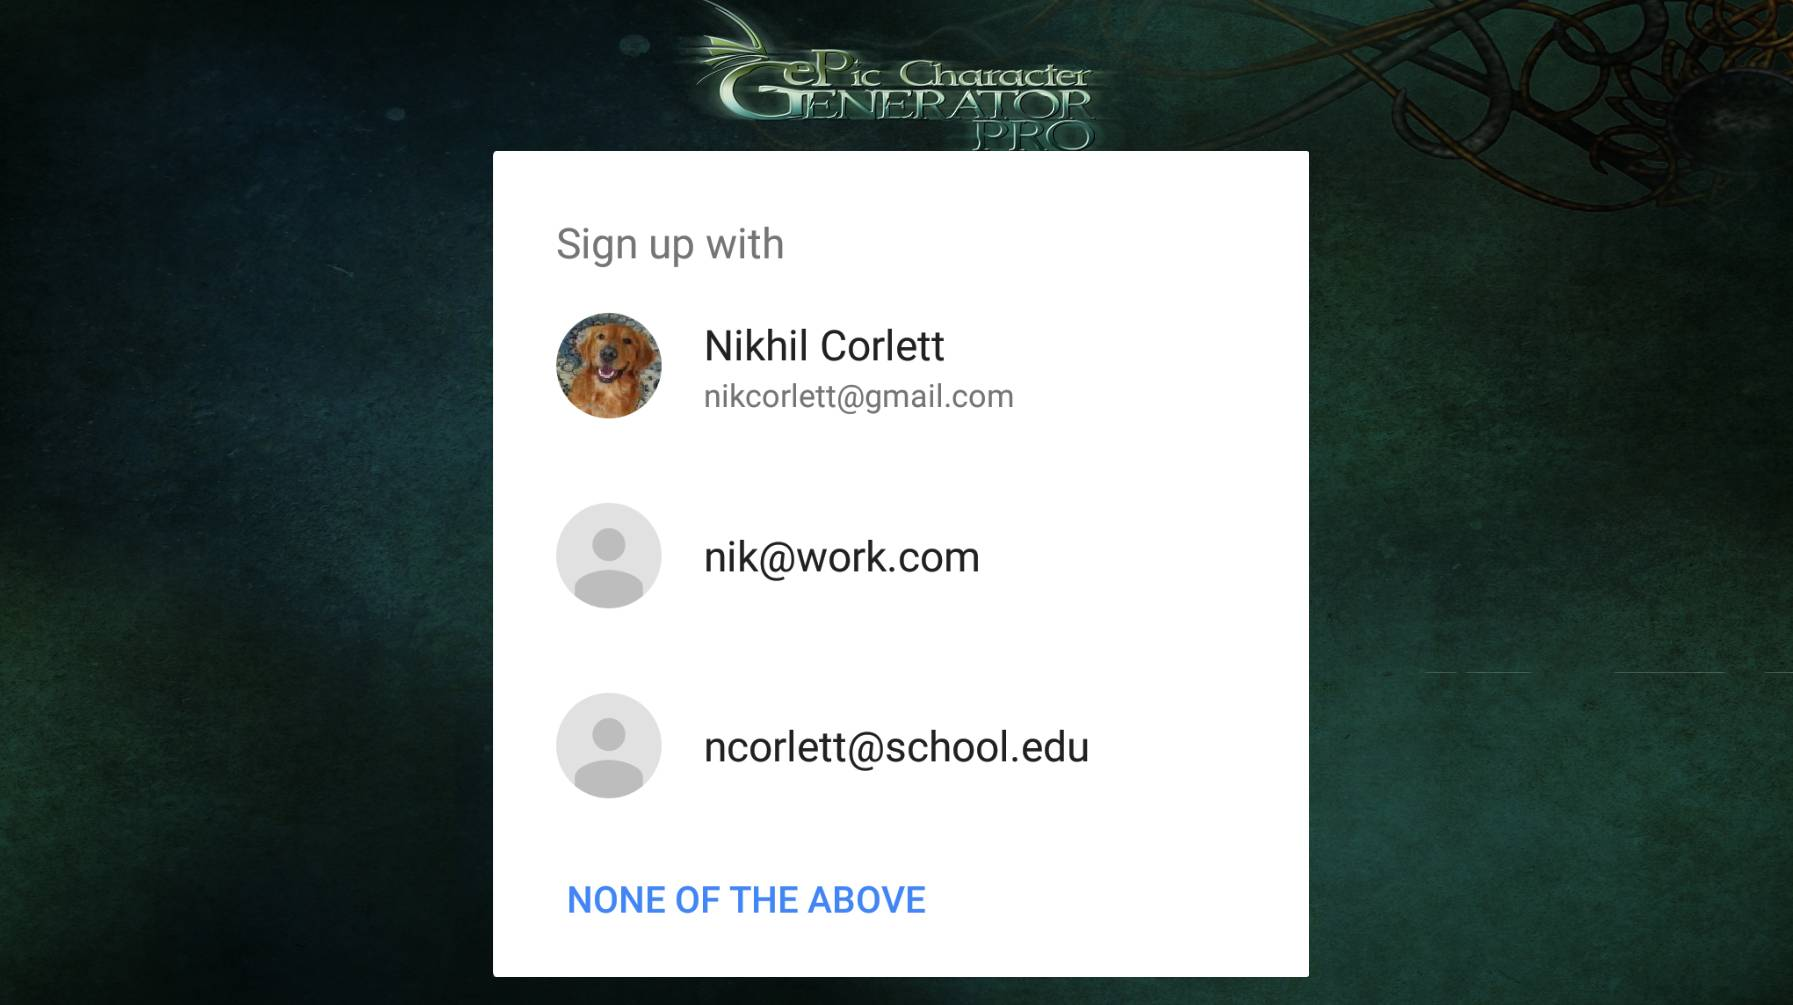 ePic Character Generator Google Signin